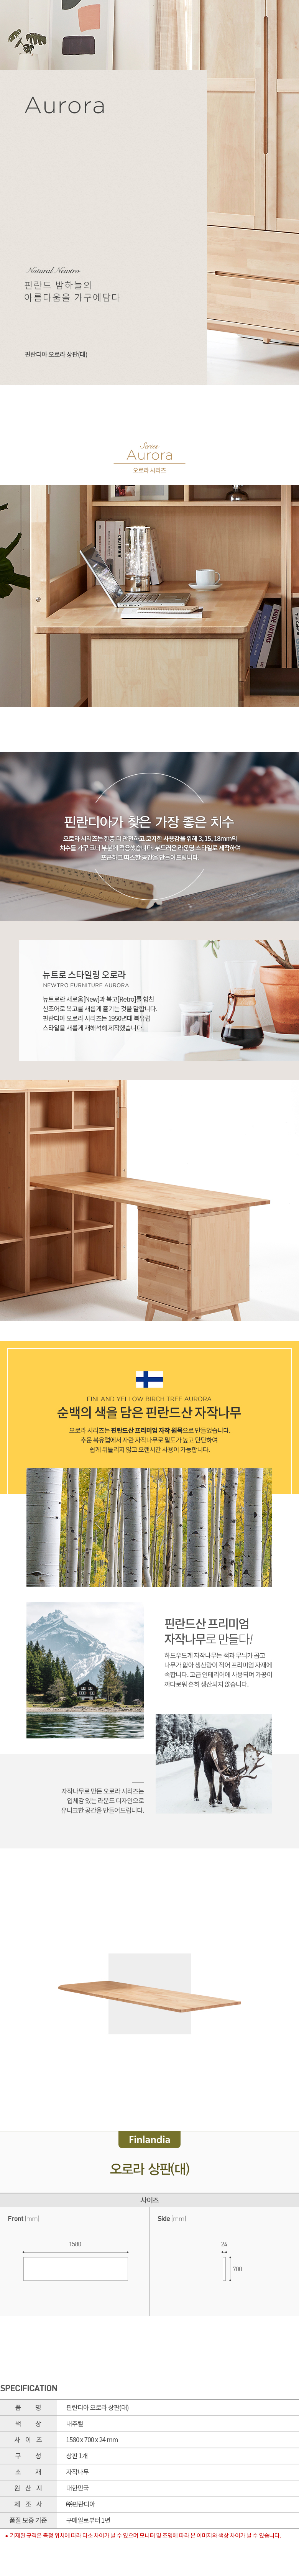 tabletop_L.jpg